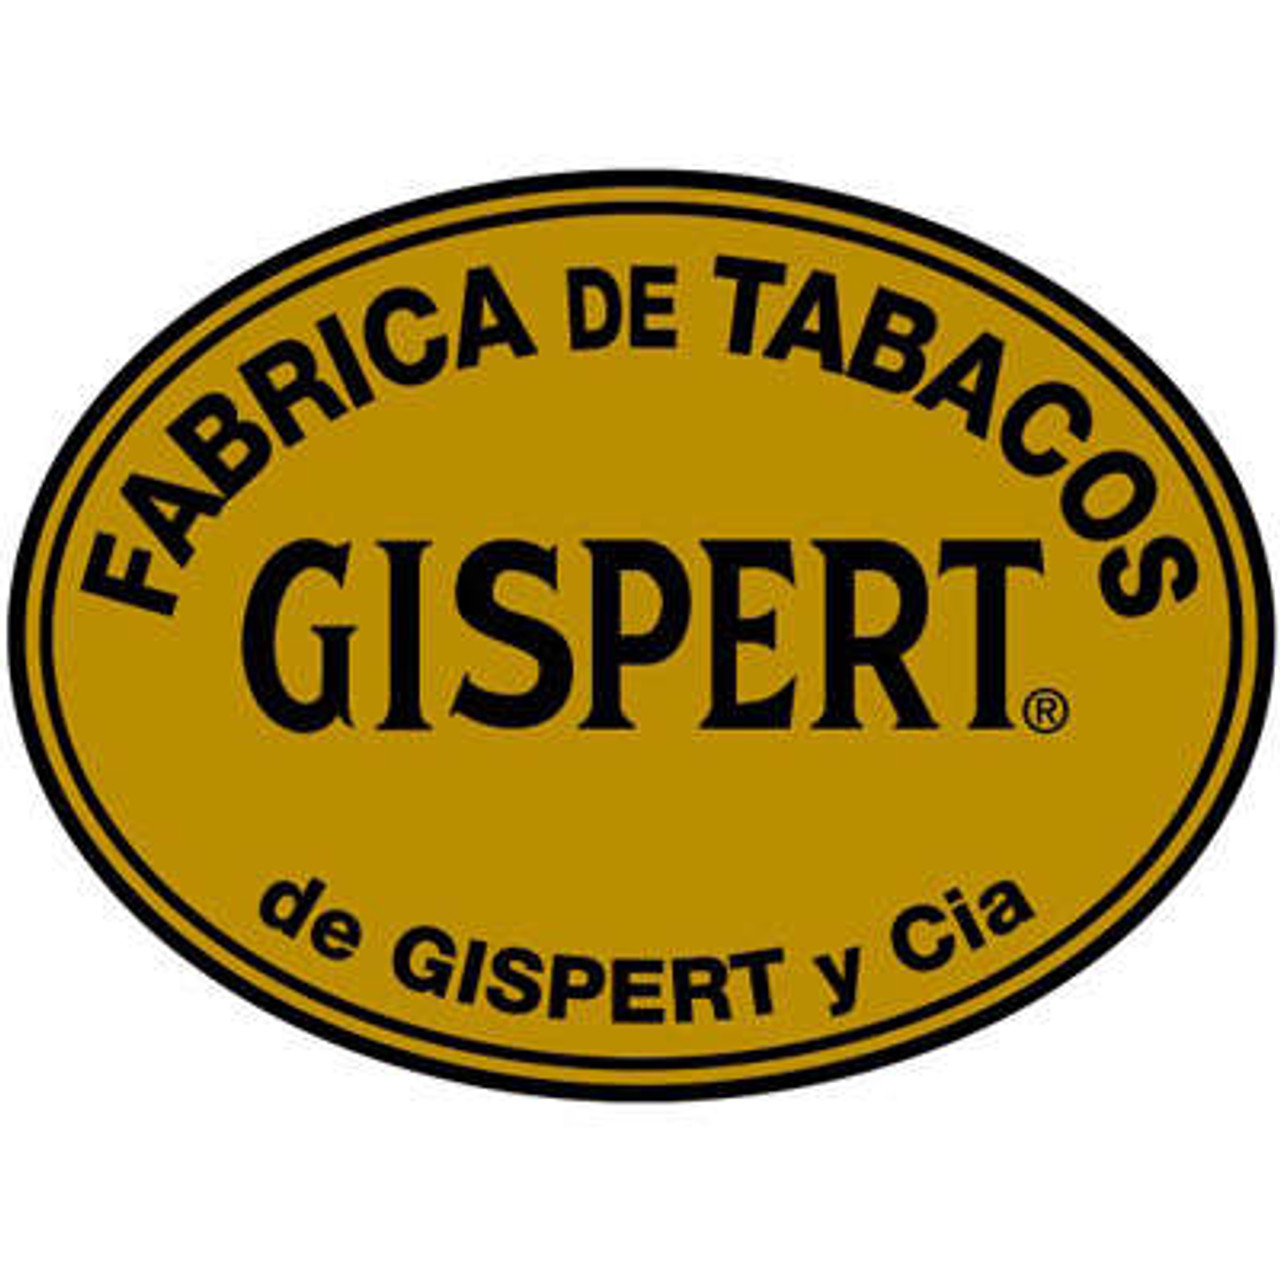 Gispert Churchill Cigars - 7 x 54 (Box of 25)